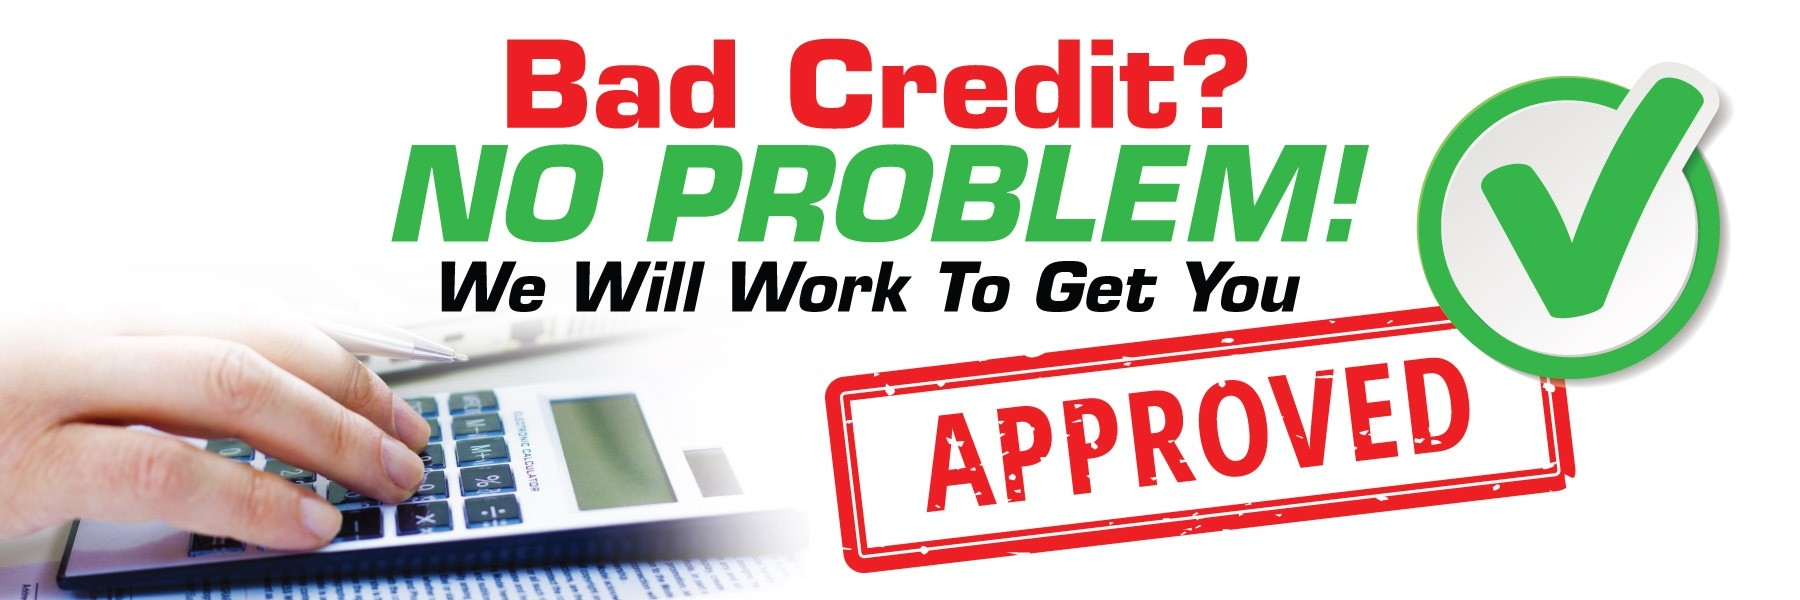 Honda Dealers Nj >> New and Used Honda Dealer In New Jersey | Autosport Honda ...